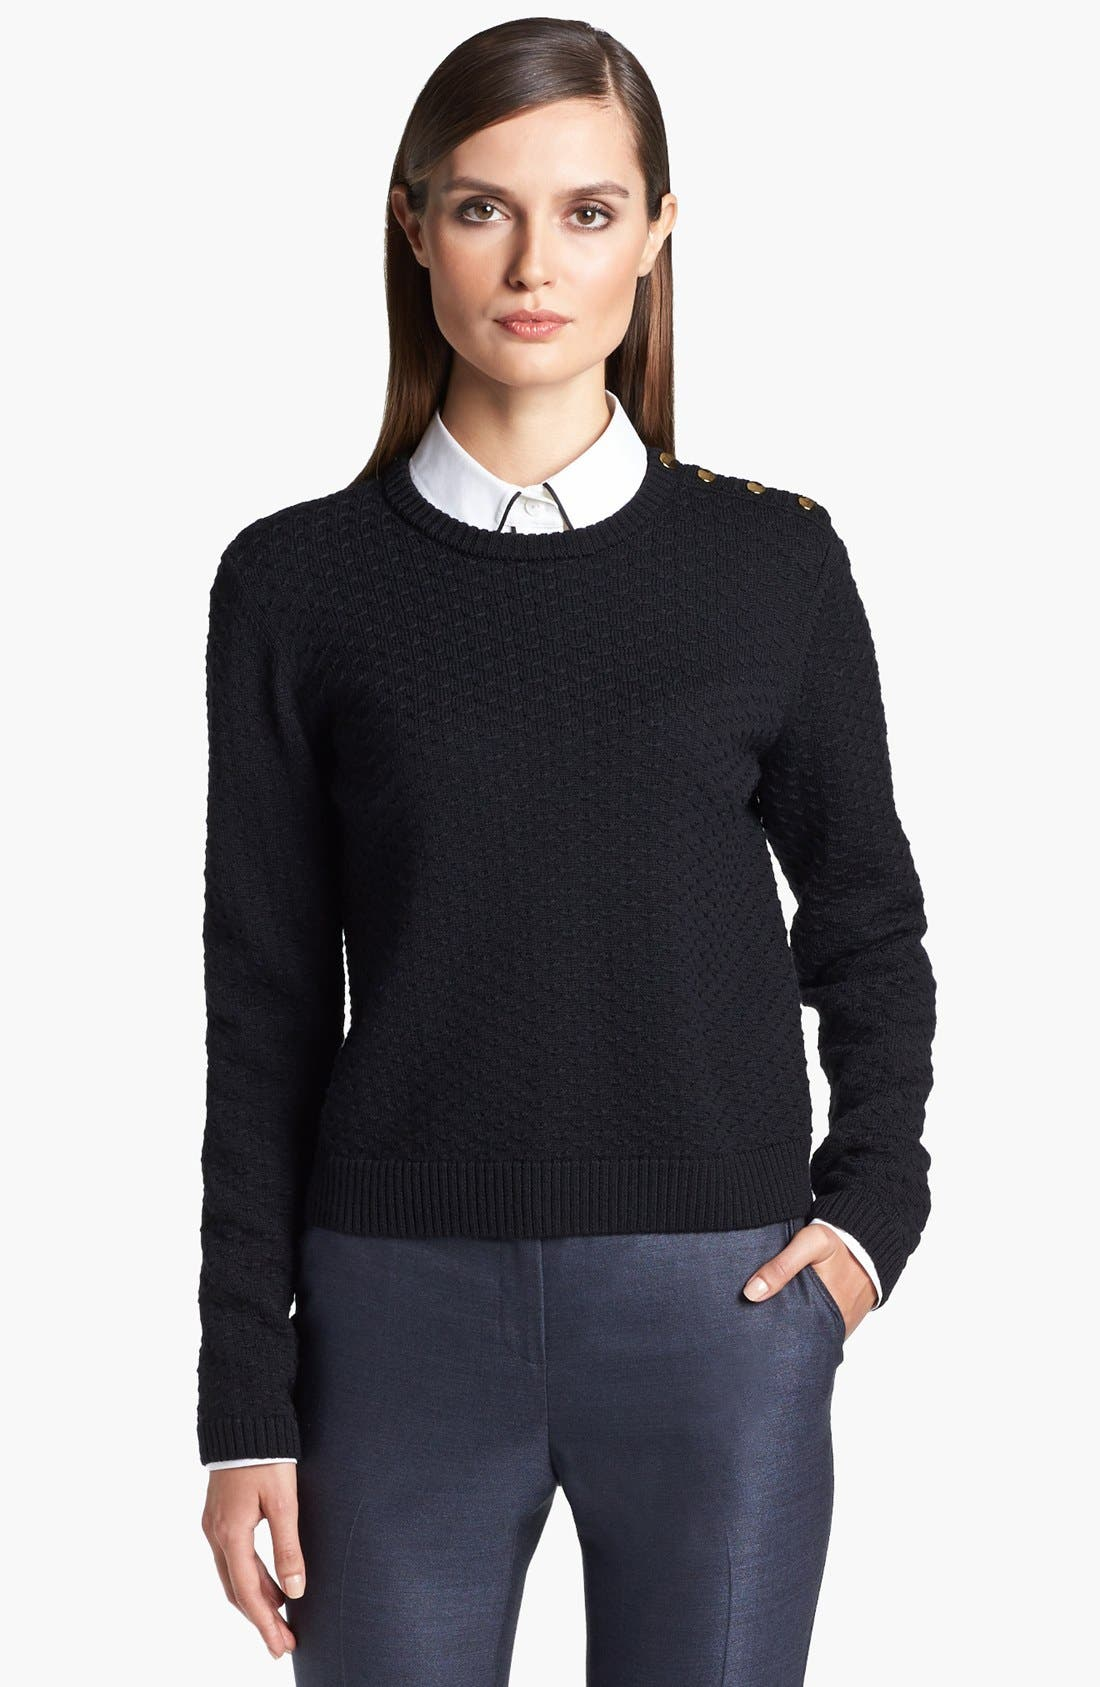 Alternate Image 1 Selected - St. John Yellow Label Shoulder Snap Eyelet Knit Sweater